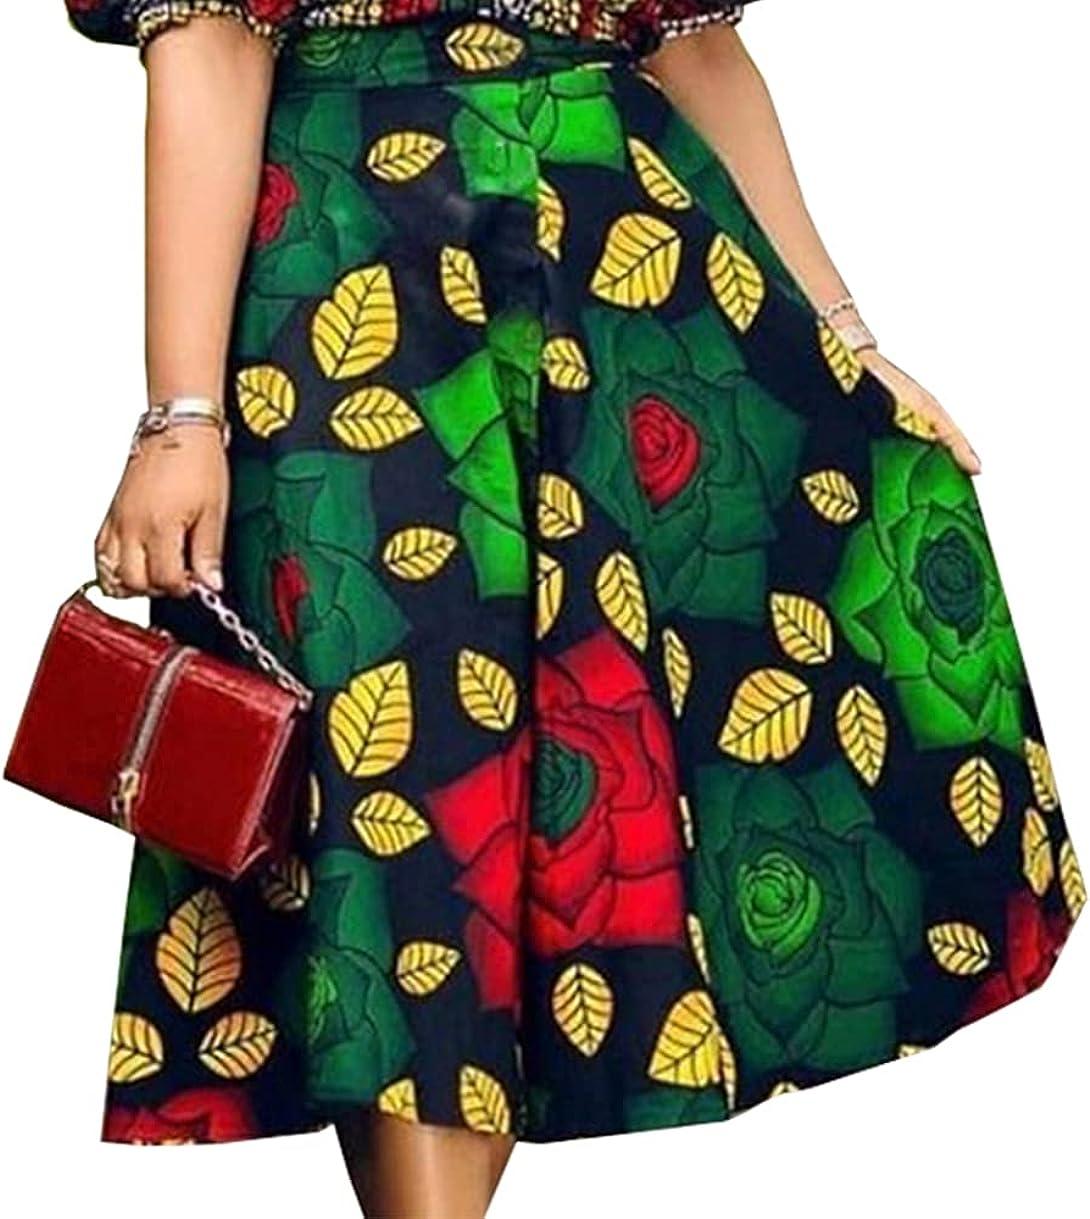 AOMEI Women's Green High Waist Vintage Floral Leaf Printed A-Line Skirt